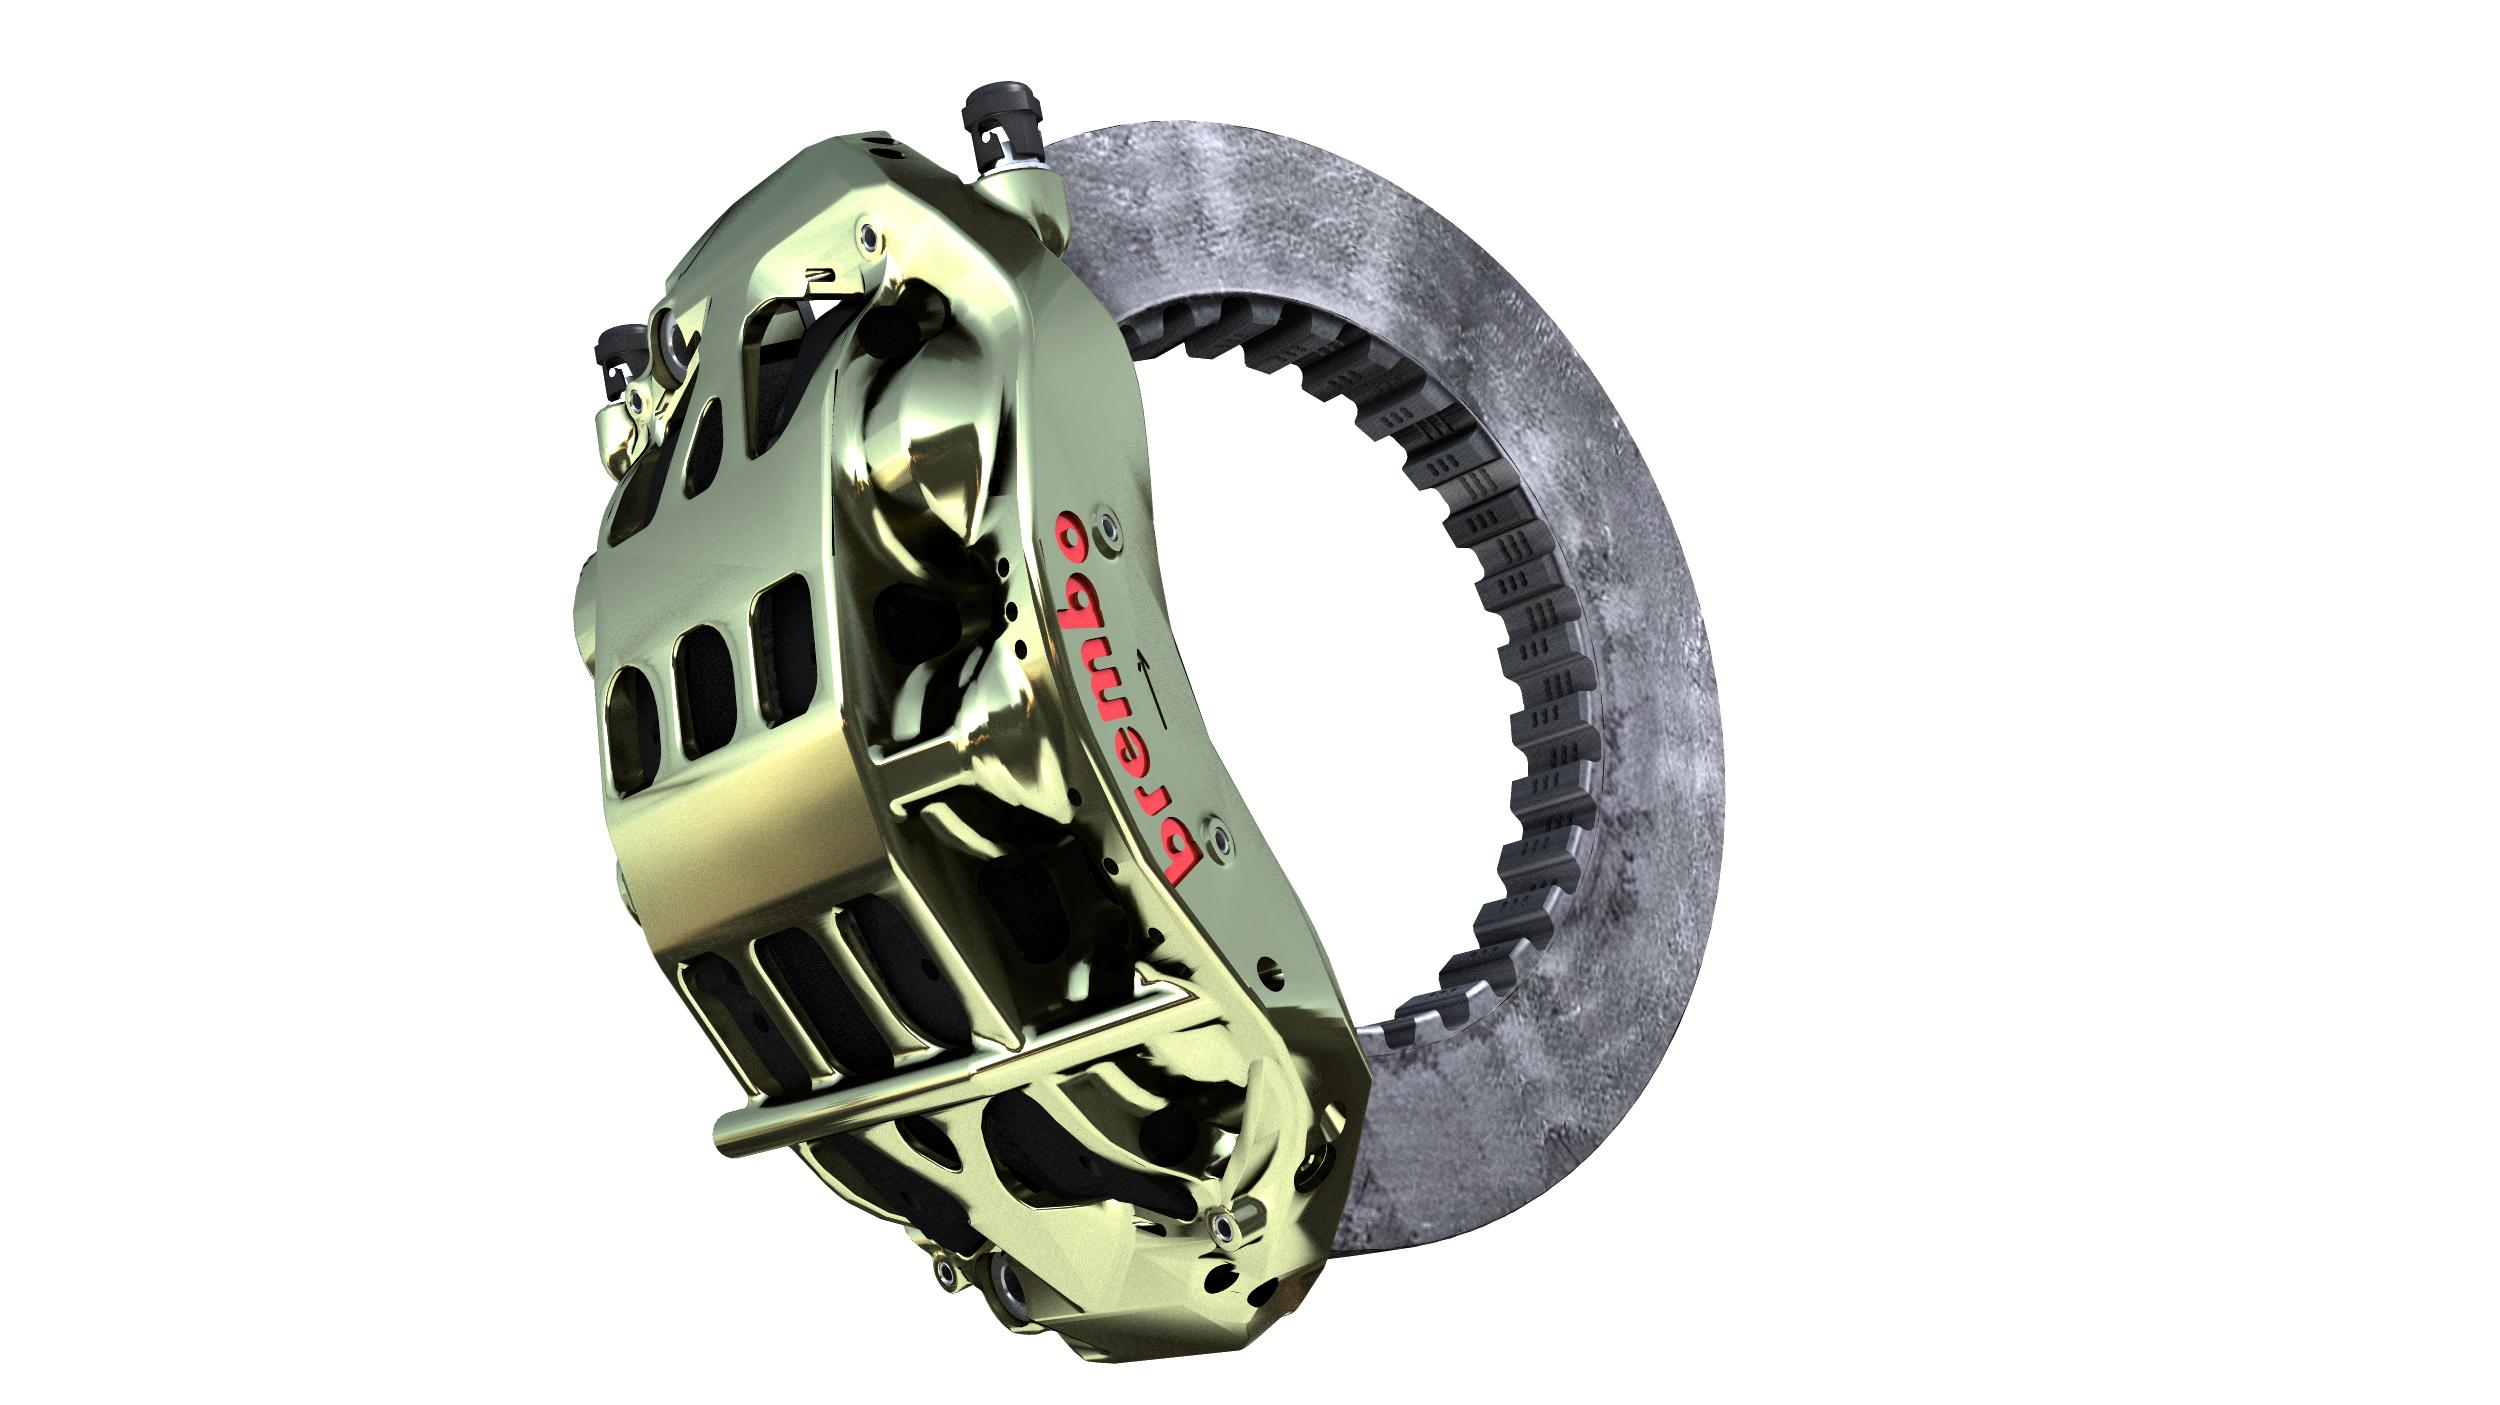 f1-brembo-braking-system.jpg